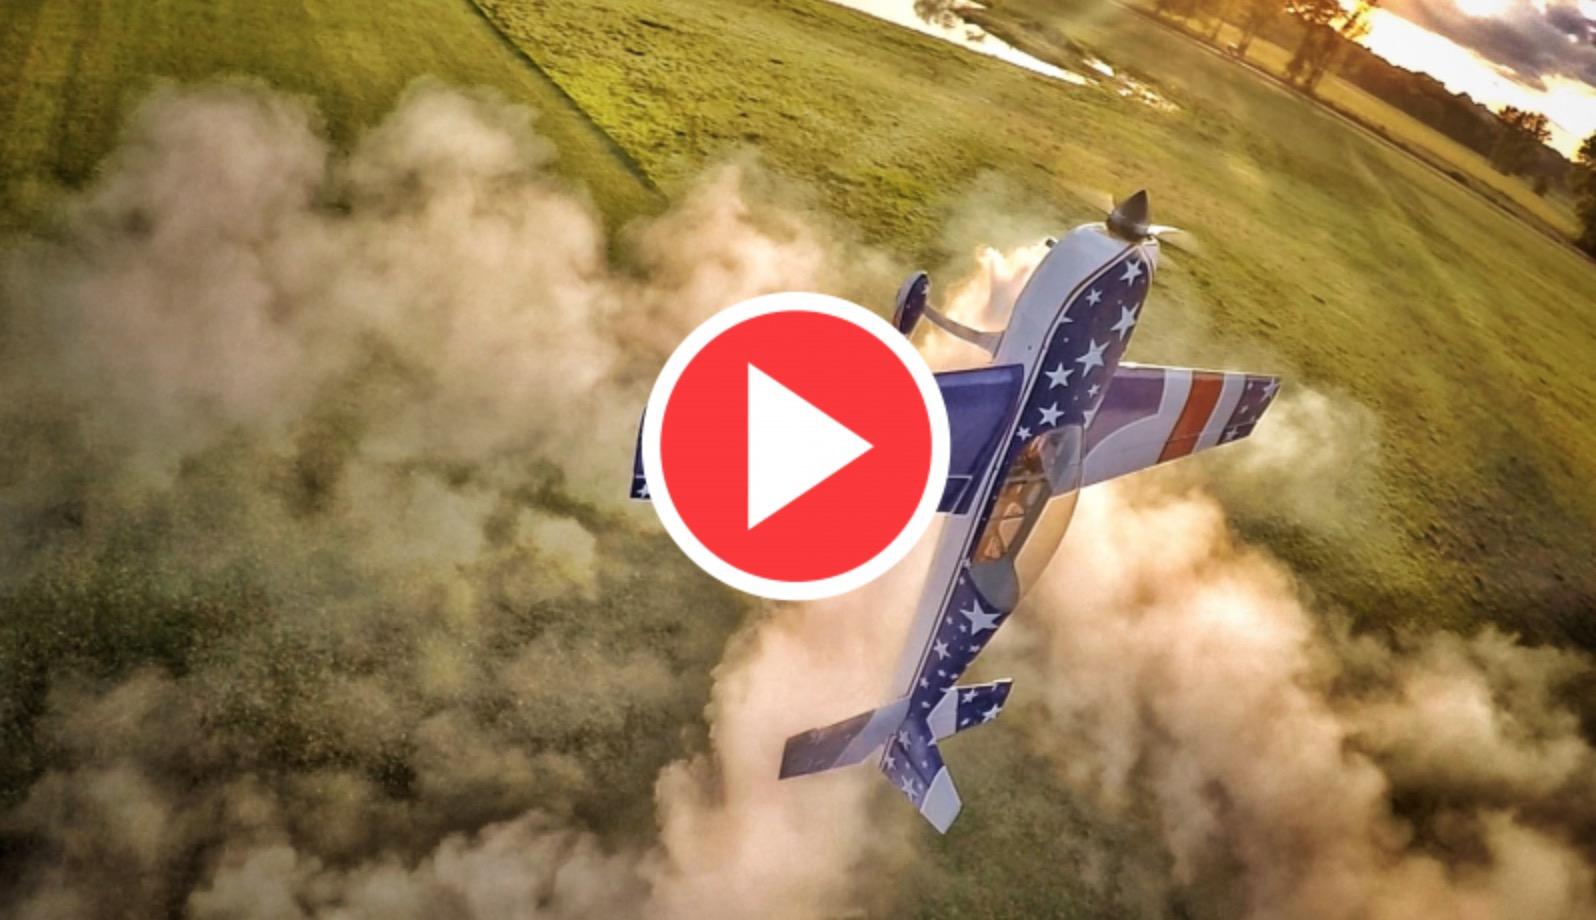 Mr Steele FPV Joe Nall Flugzeuge 3D